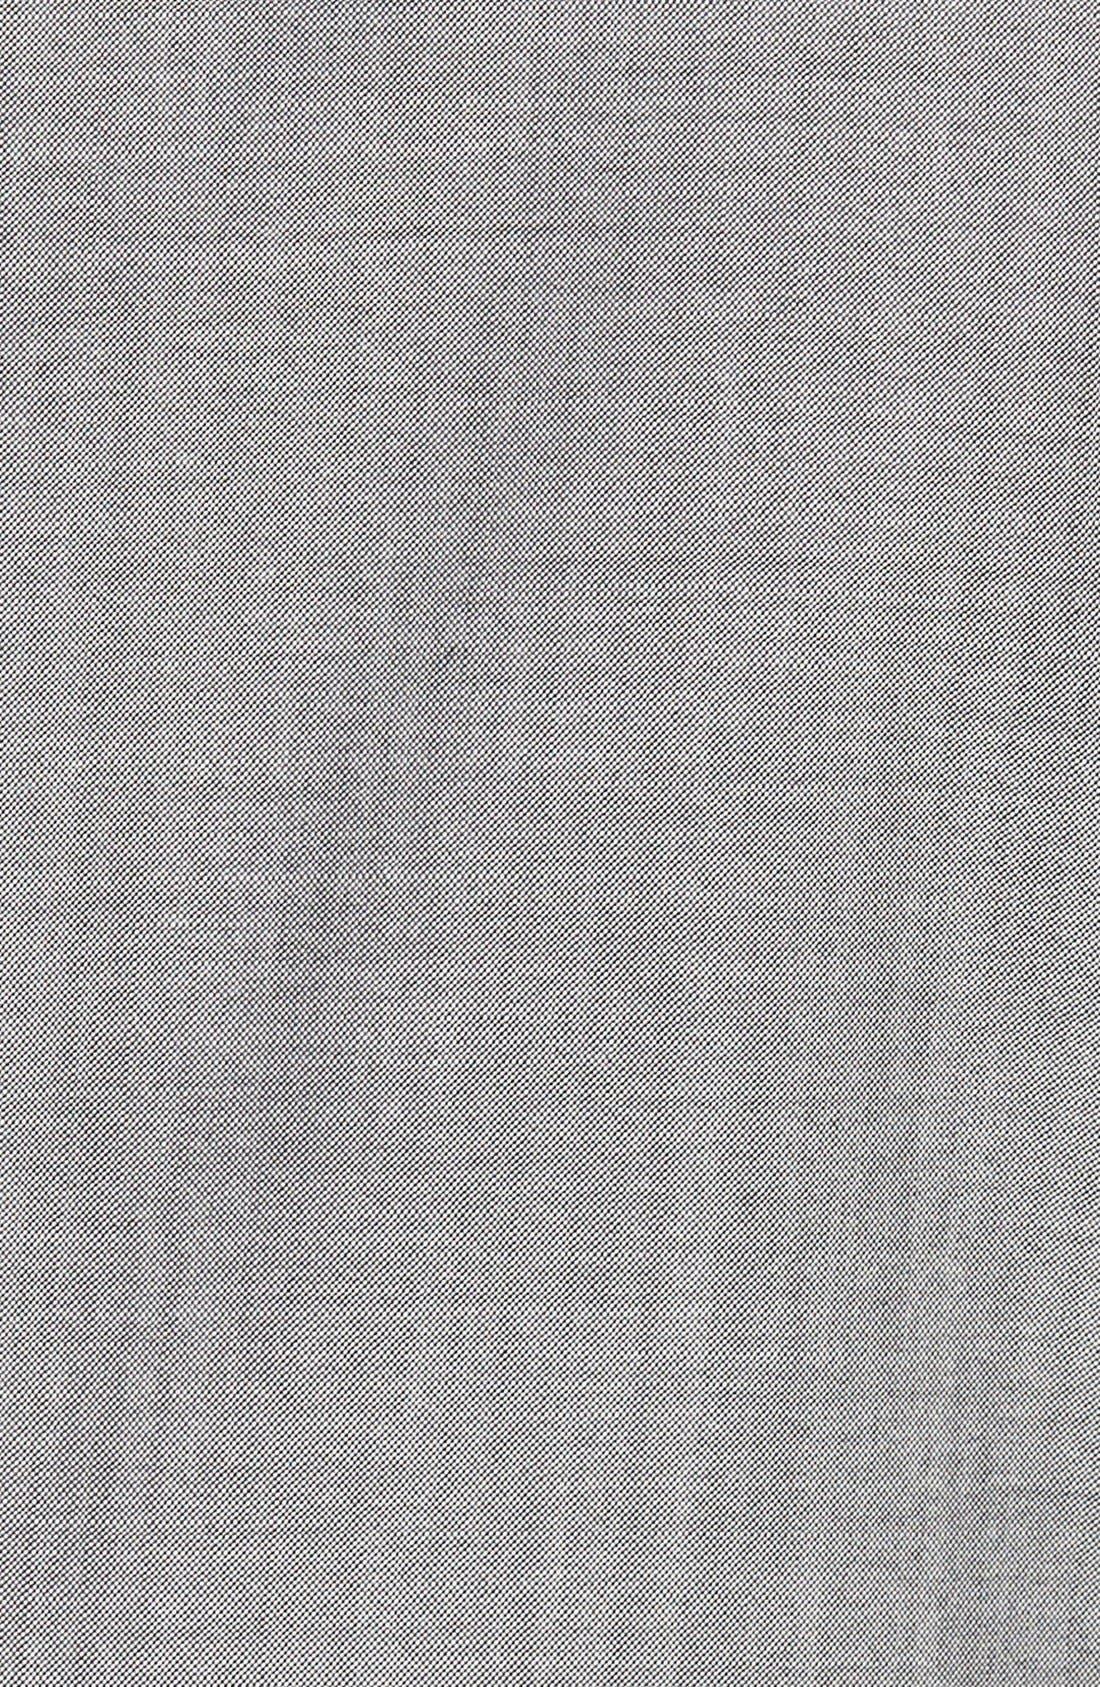 'Huge/Genius' Trim Fit Solid Wool Suit,                             Alternate thumbnail 14, color,                             PEARL GREY